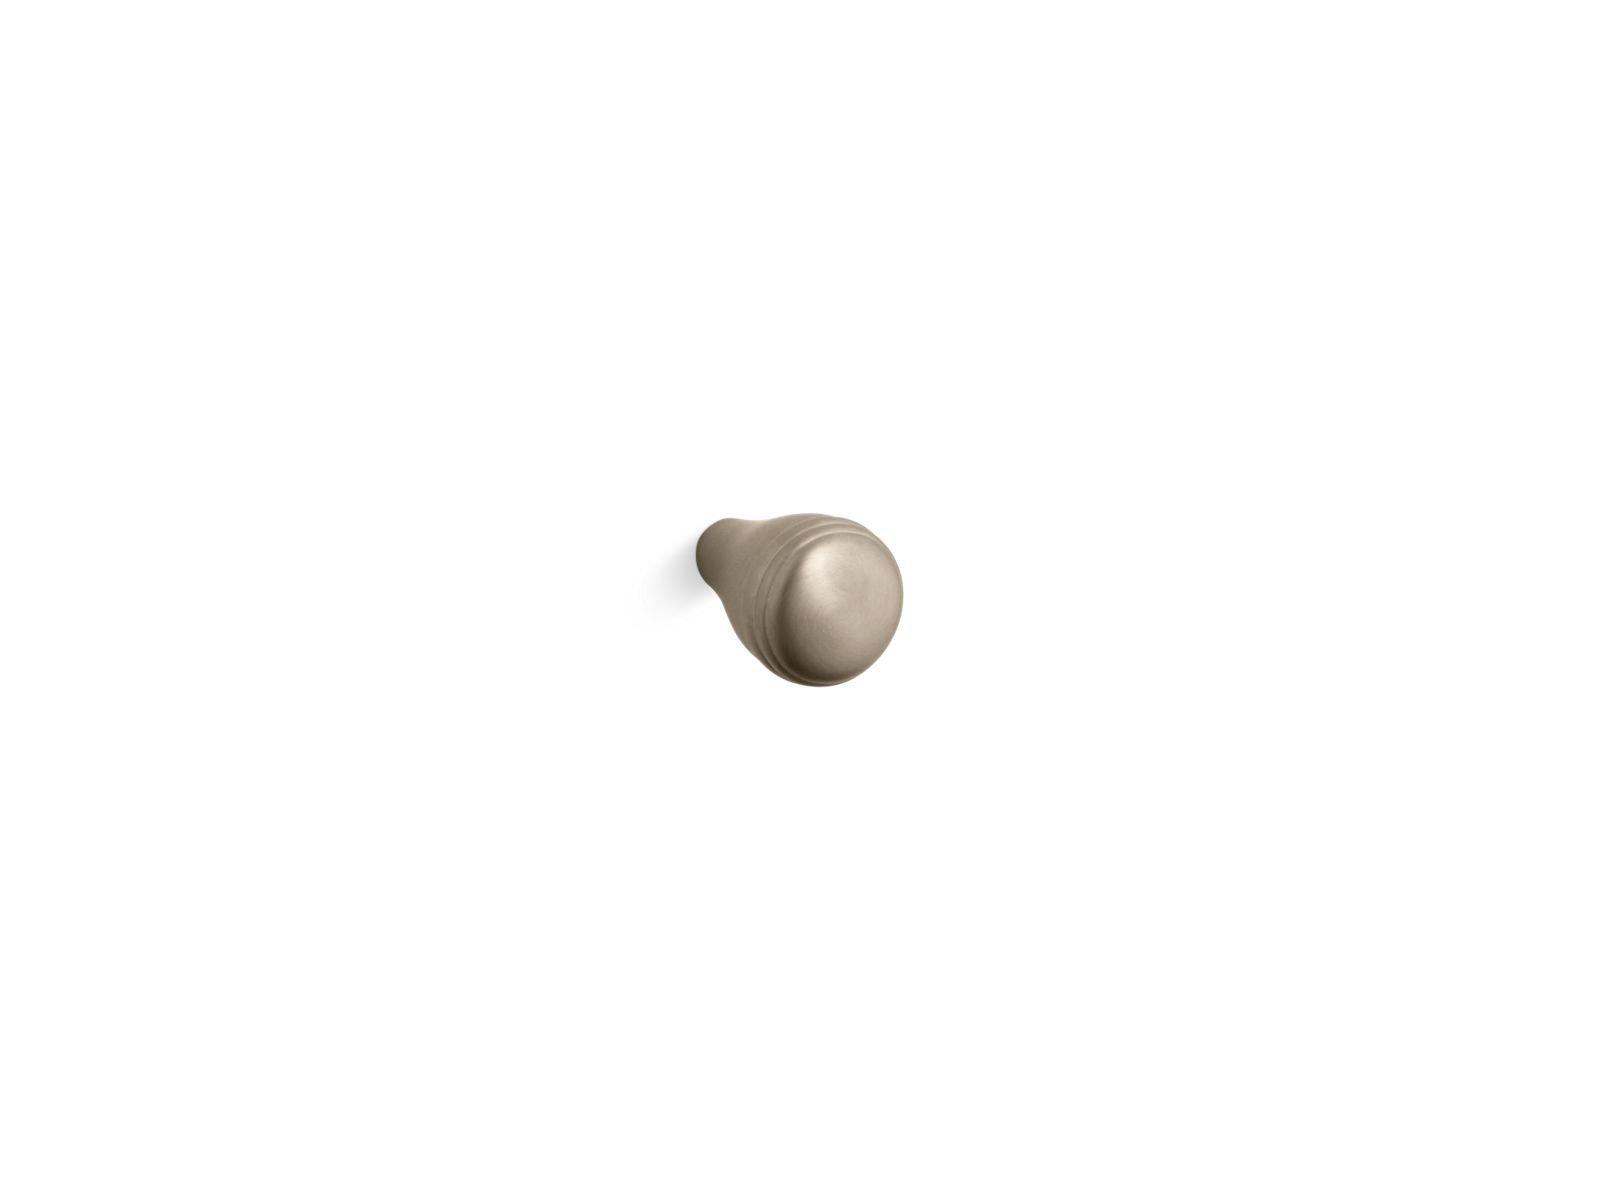 Kohler K-10575-BV Devonshire Cabinet Knob in Vibrant Brushed Bronze